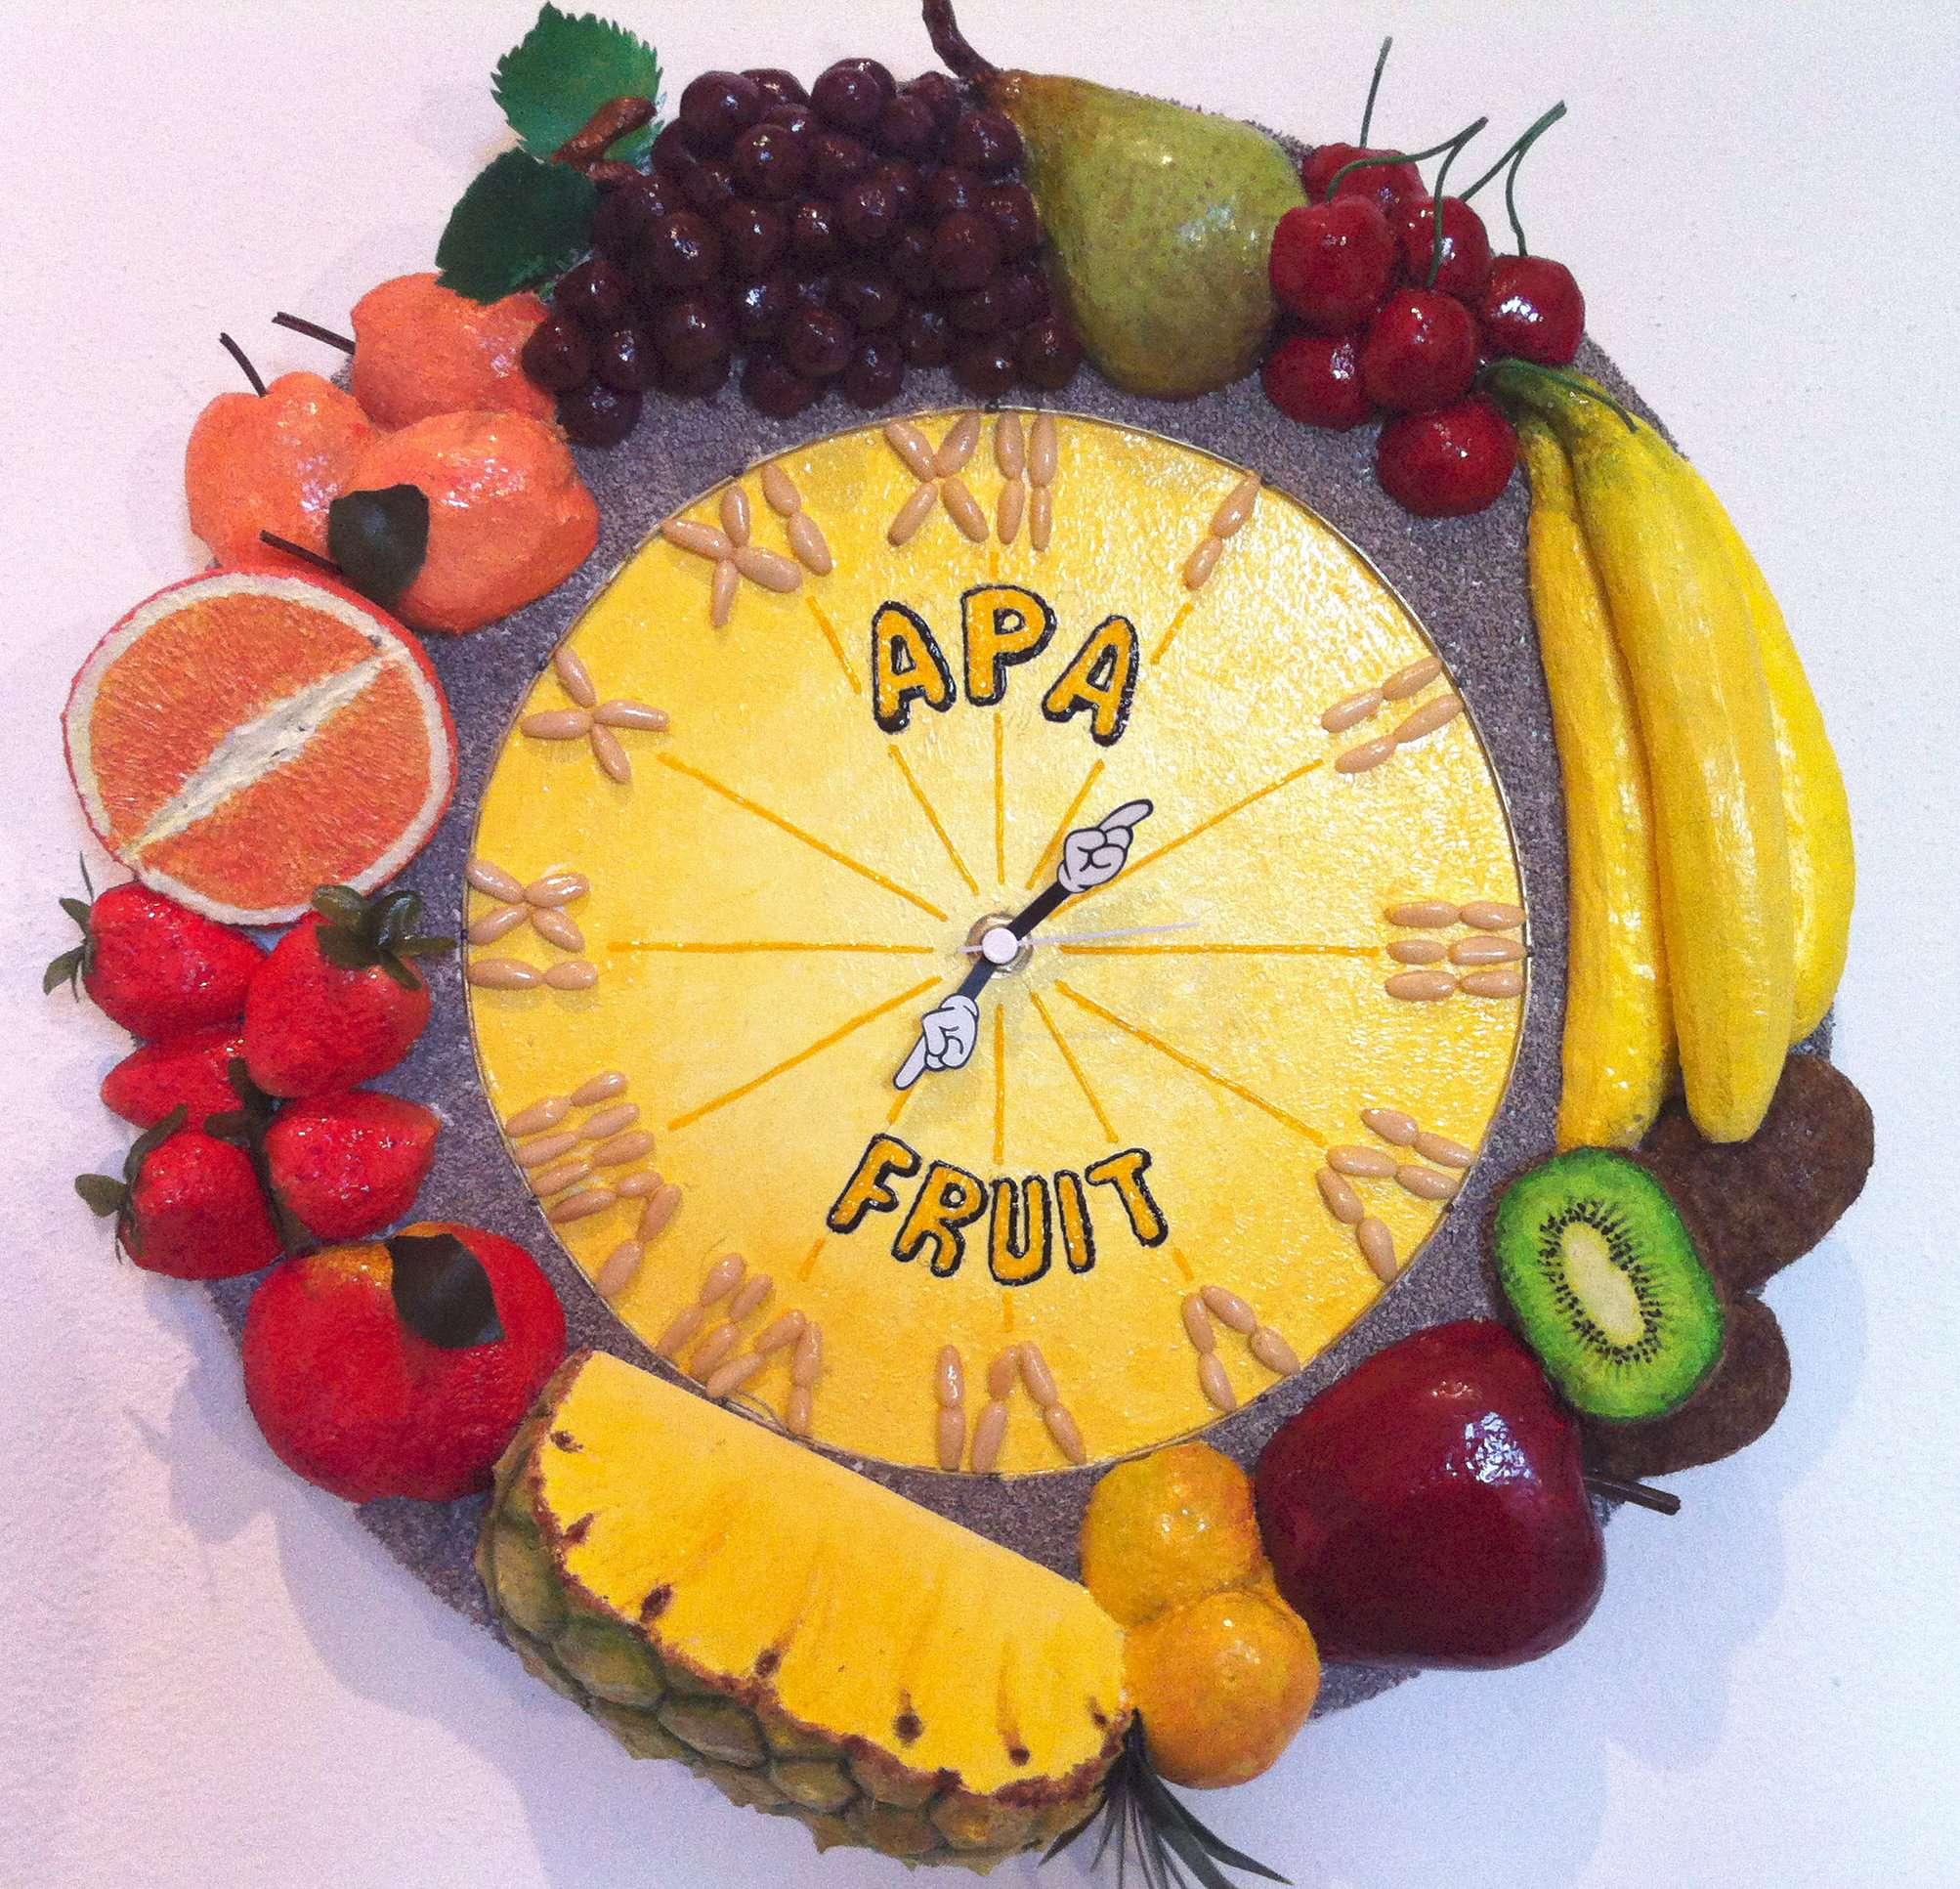 Mademaxidee : ultima fatica, fresca fresca ... Apafruit